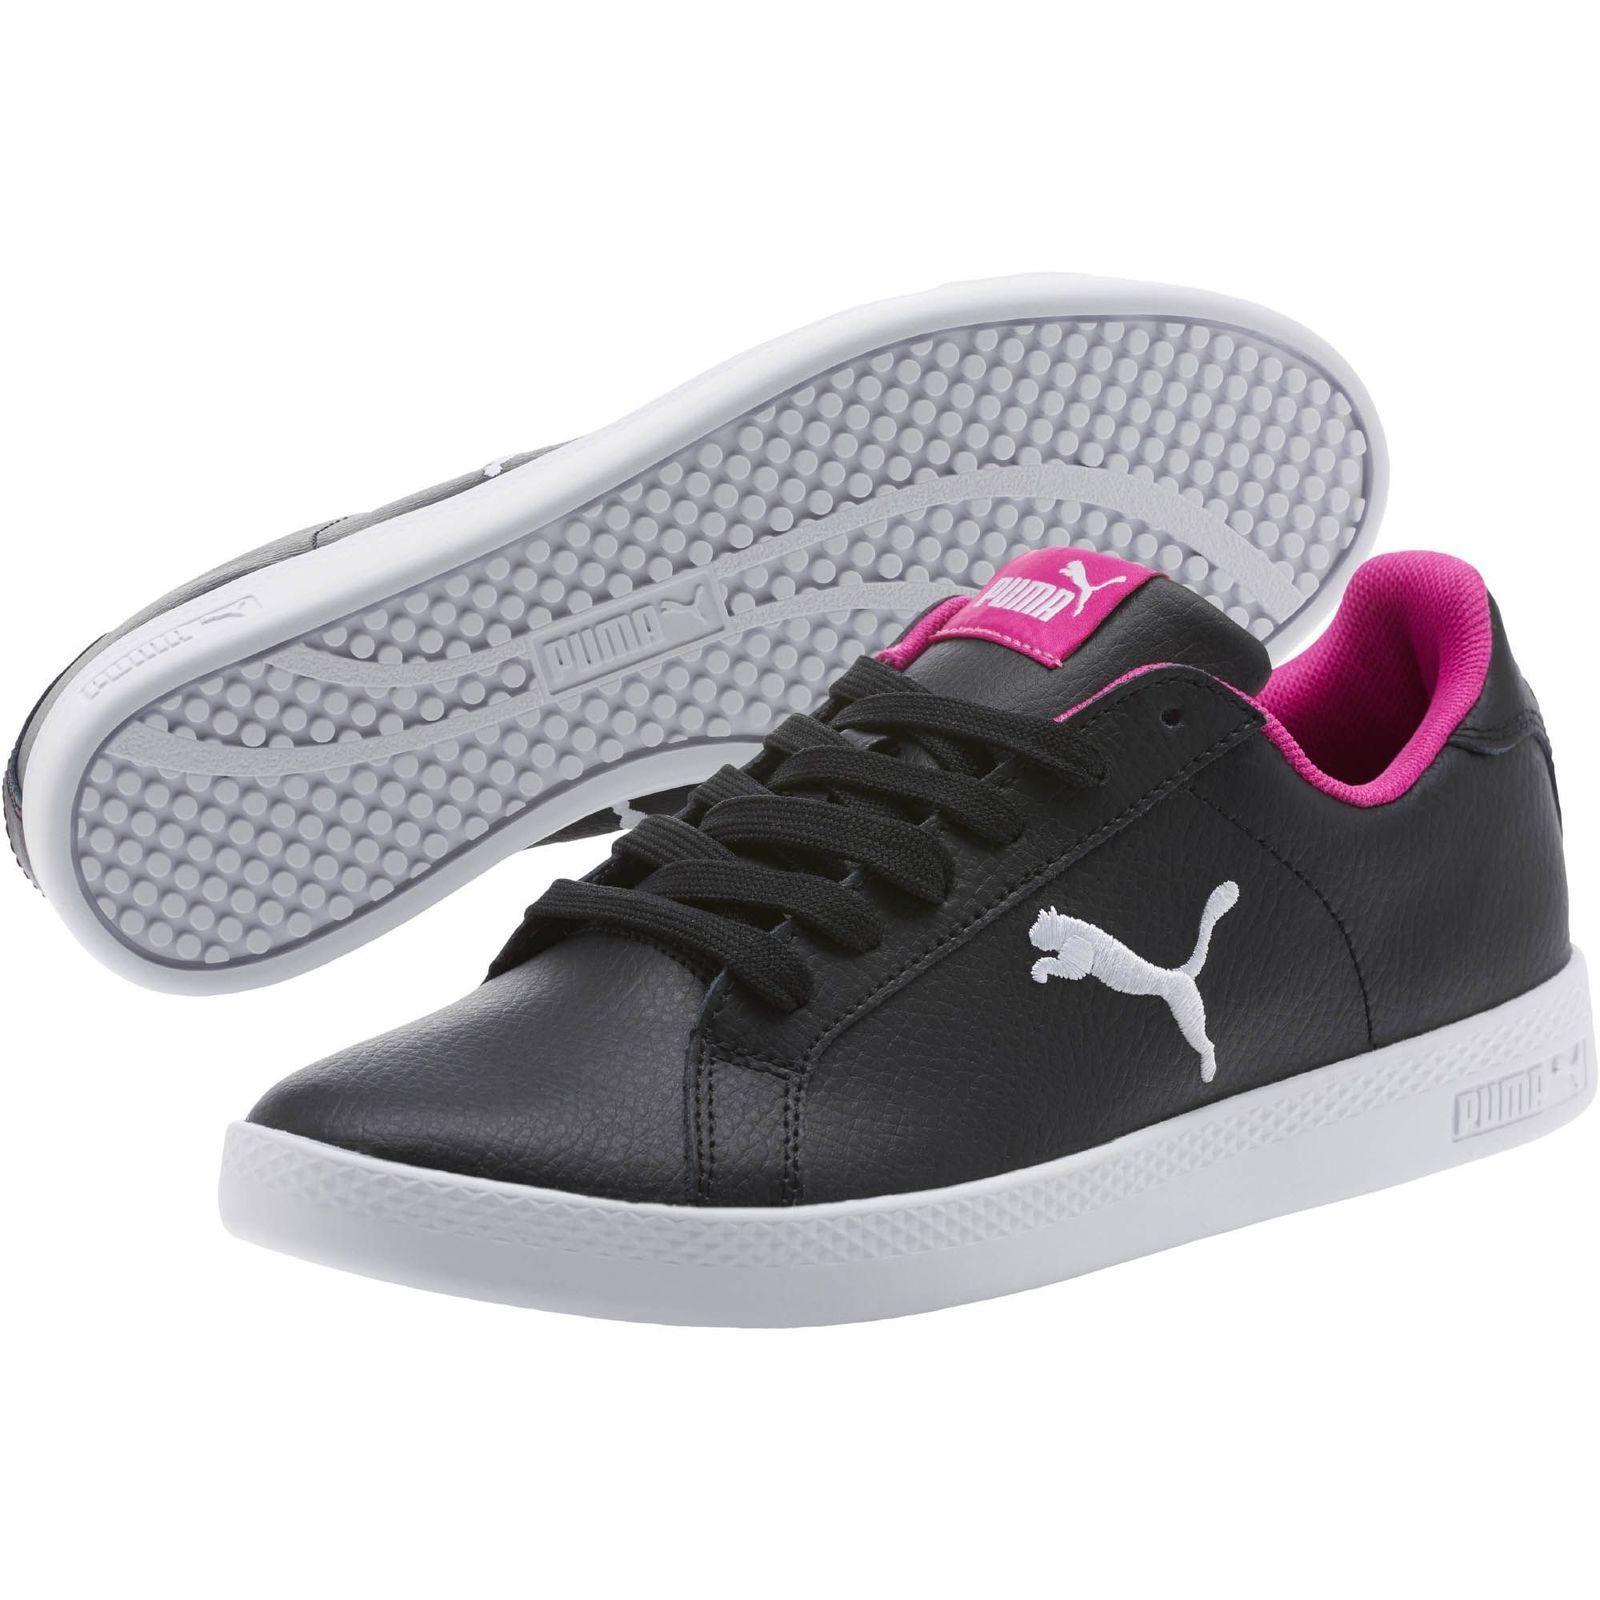 SHOPPHUT  Smash Cat L Women s Puma Sneakers  707e139b6